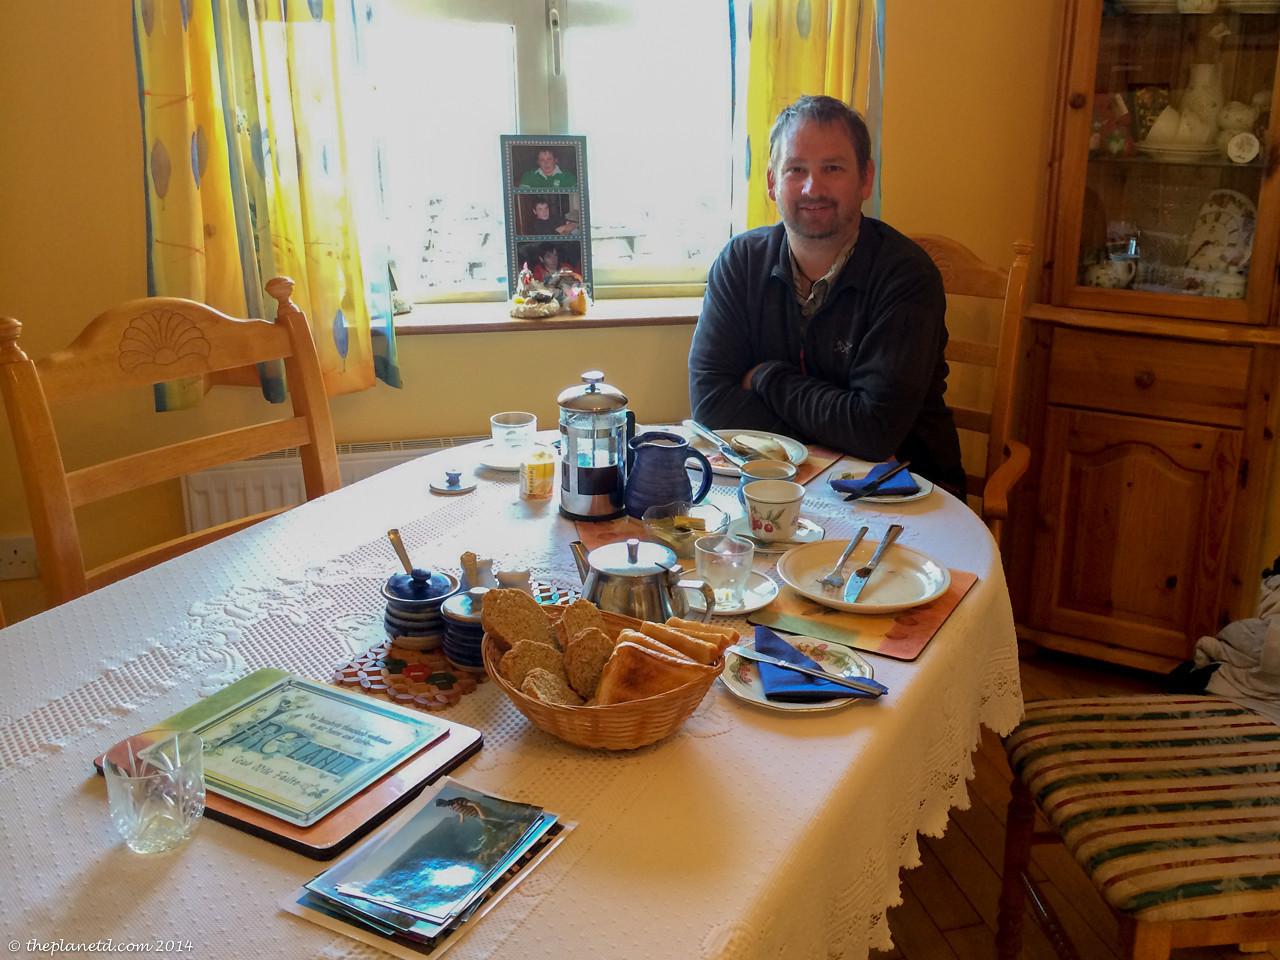 Enjoying a wonderful breakfast at Doonegore FarmHouse in Doolin, Ireland